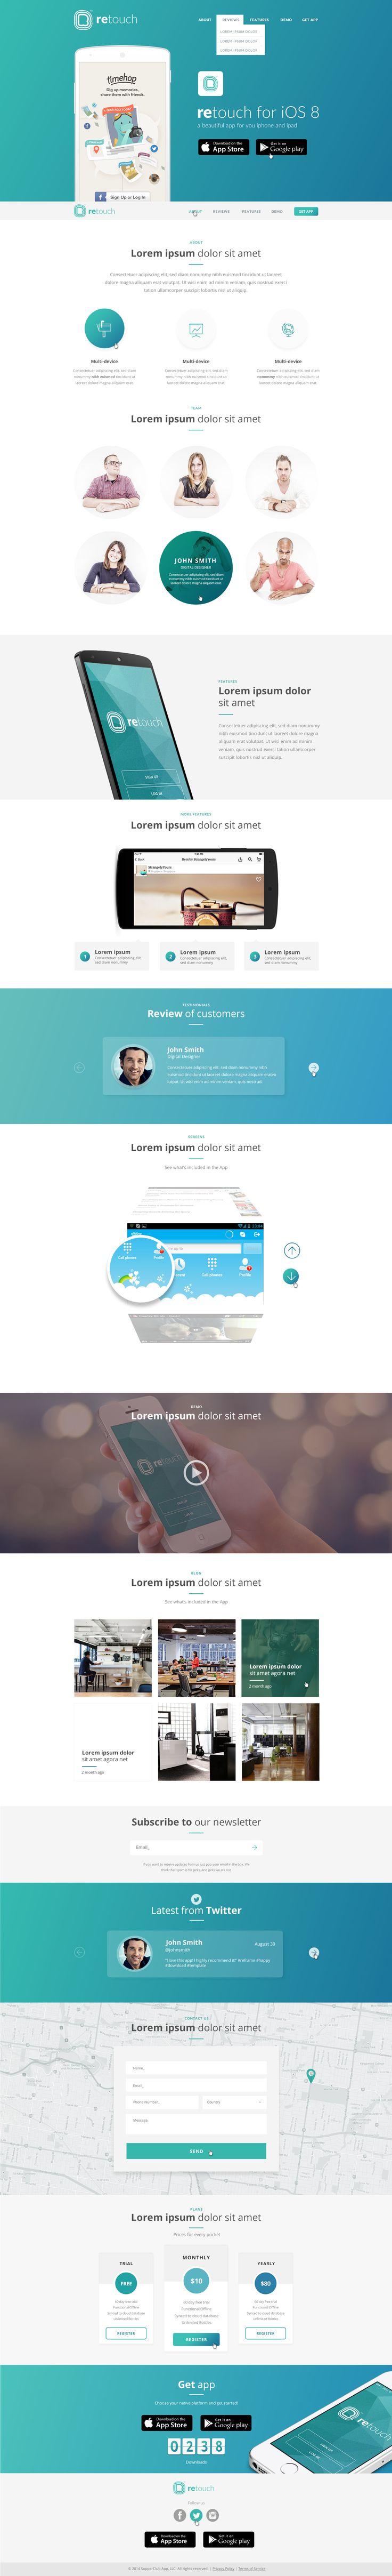 ReTouch App - App PSD Template by DarwinThemes | ThemeForest